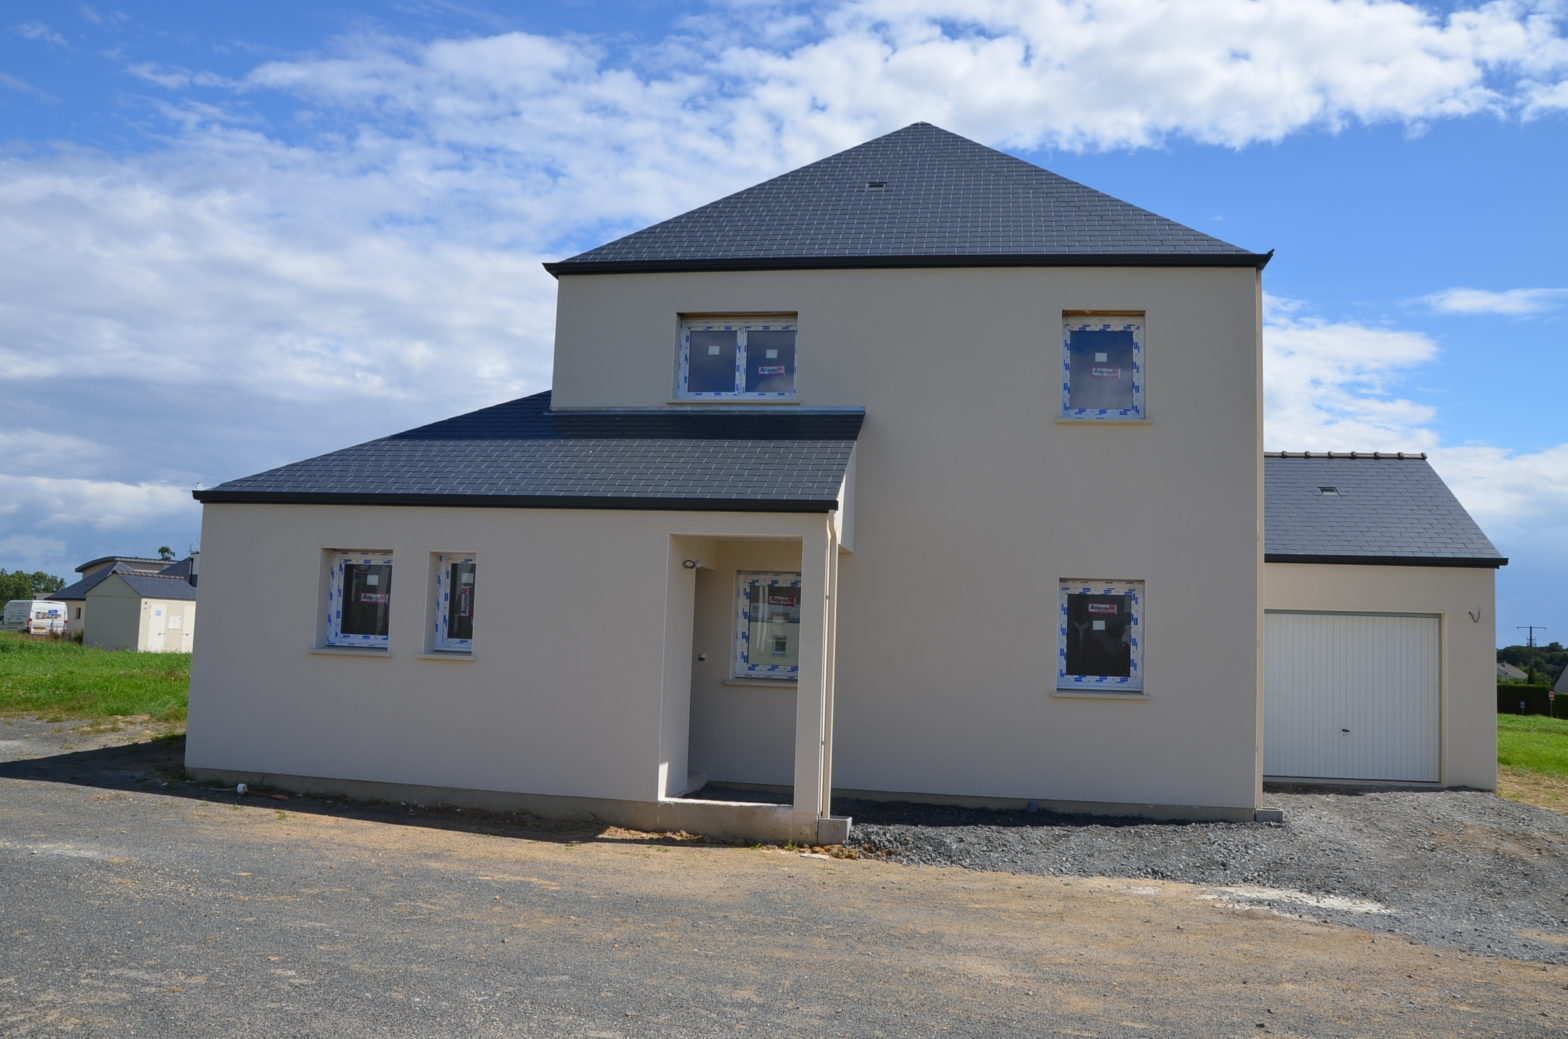 maison etage r+1 toit monopente 49125 briolay